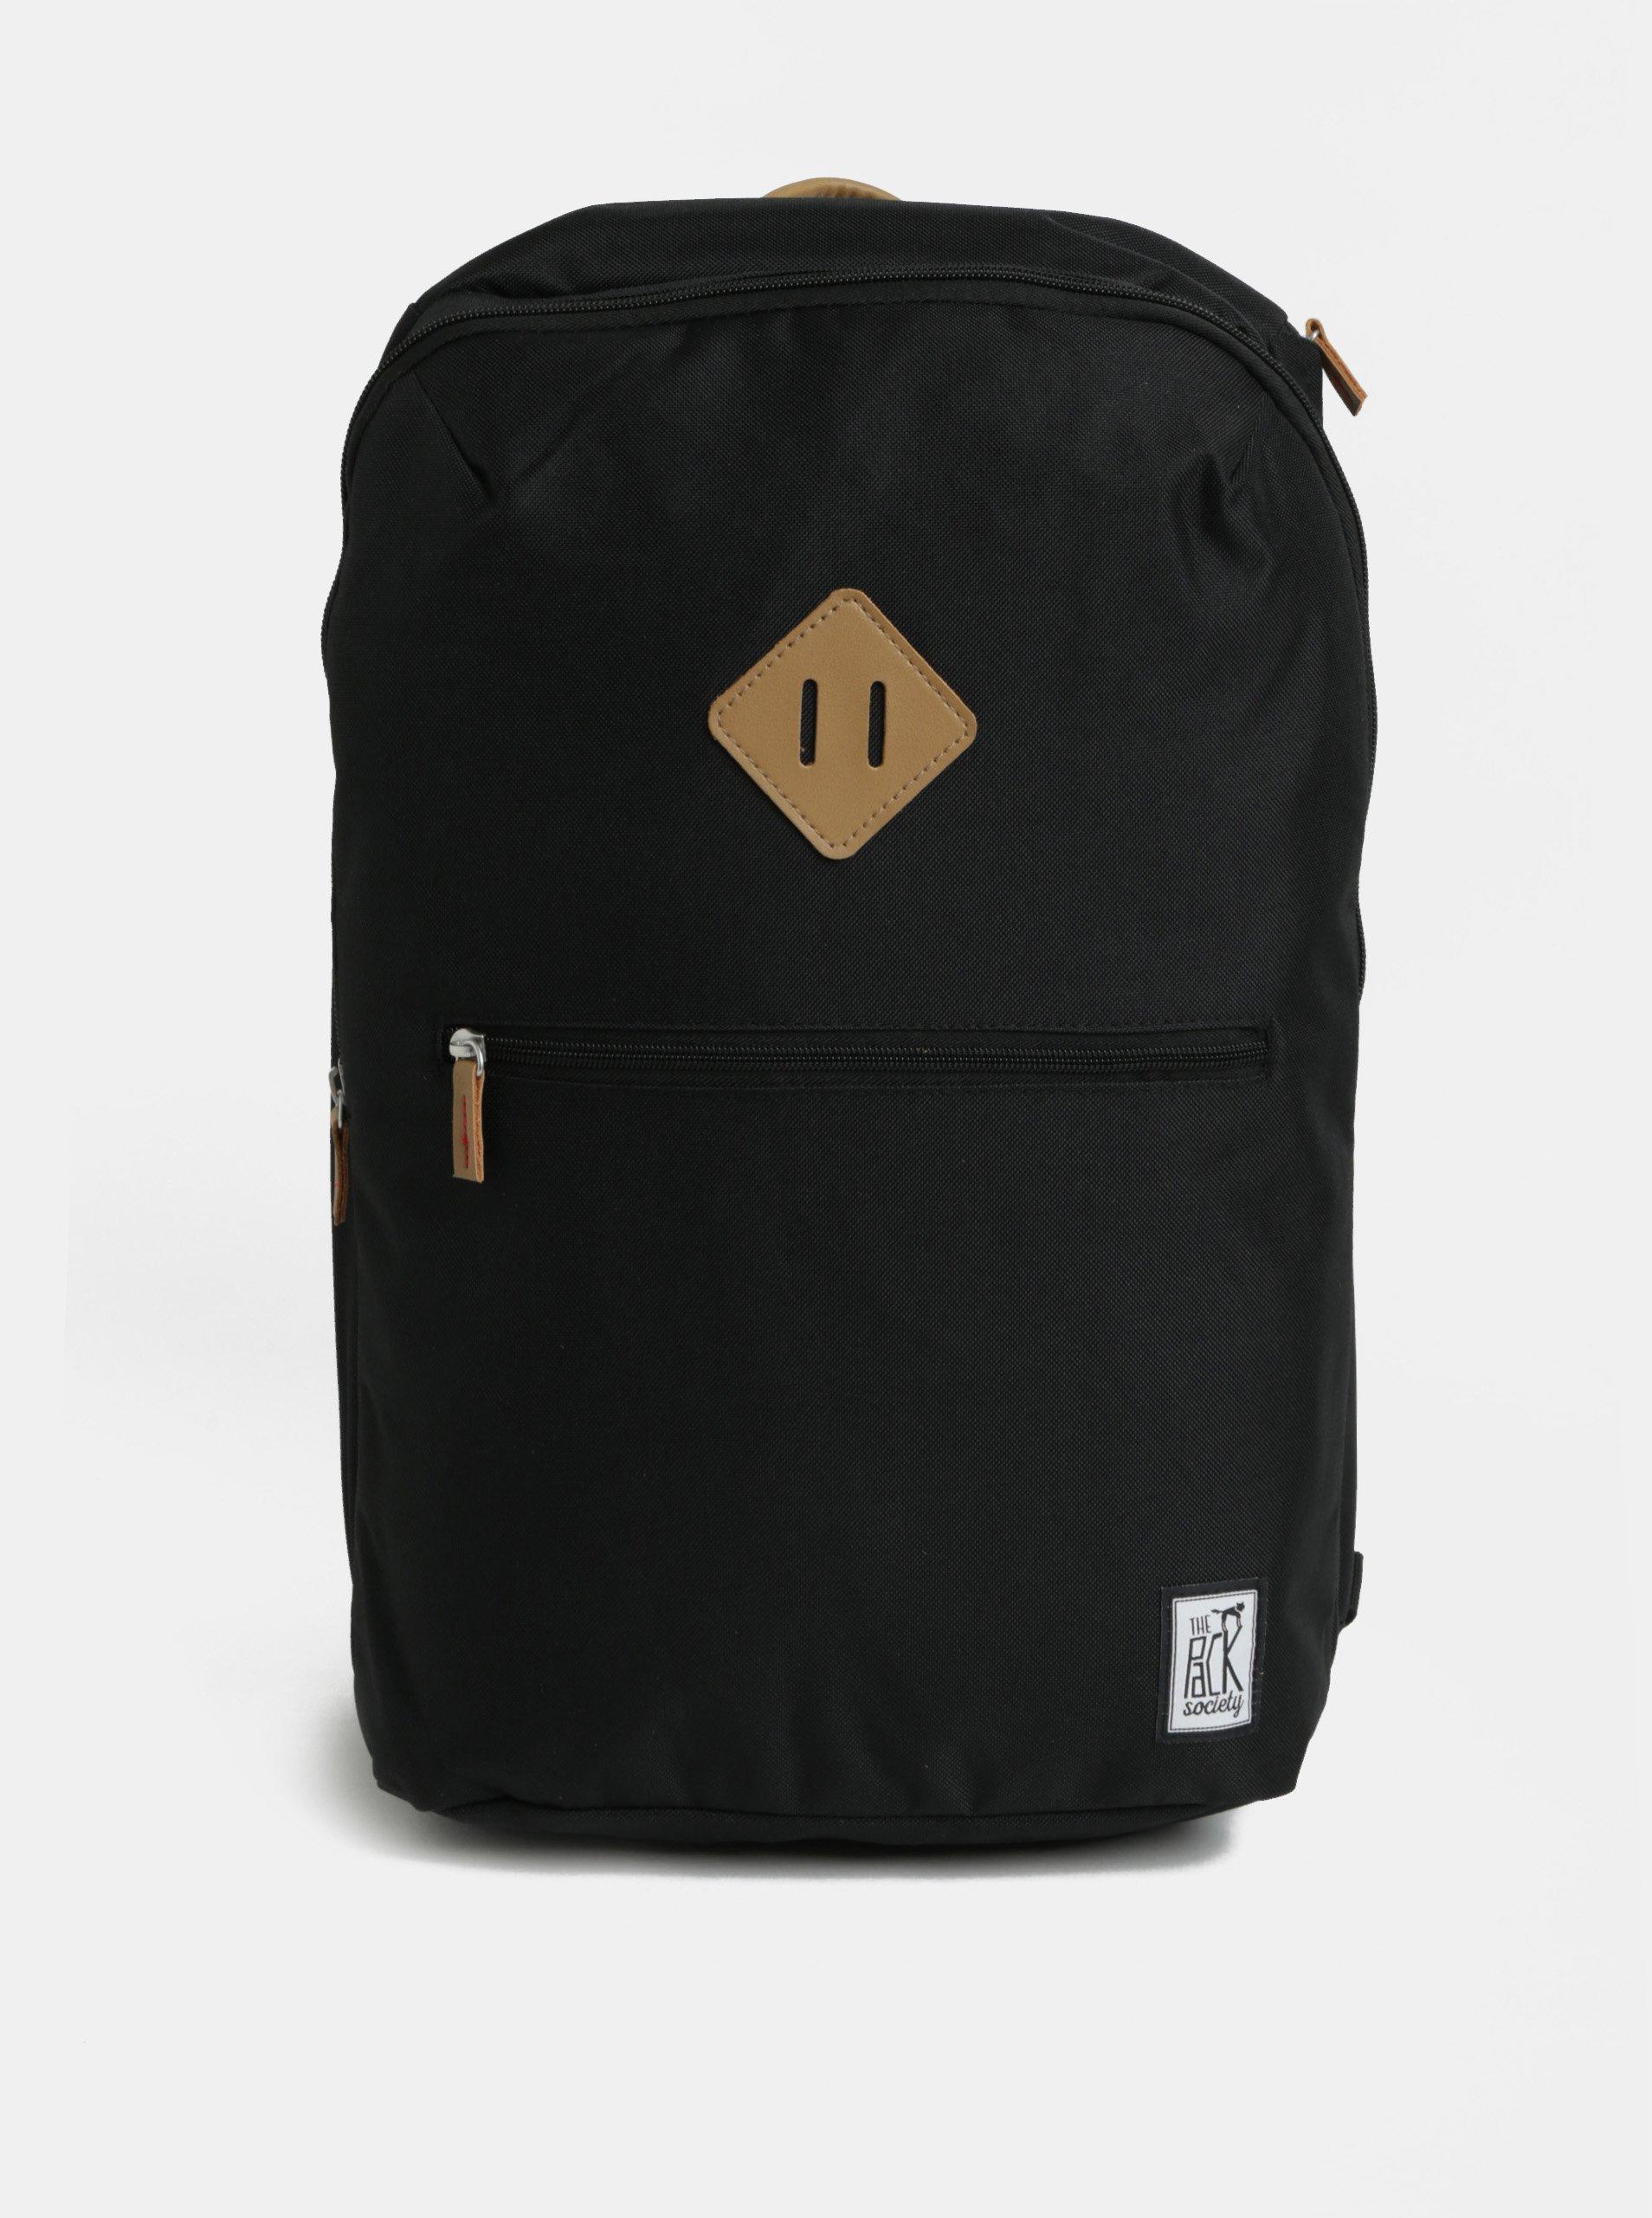 Čierny batoh The Pack Societyy 27 l